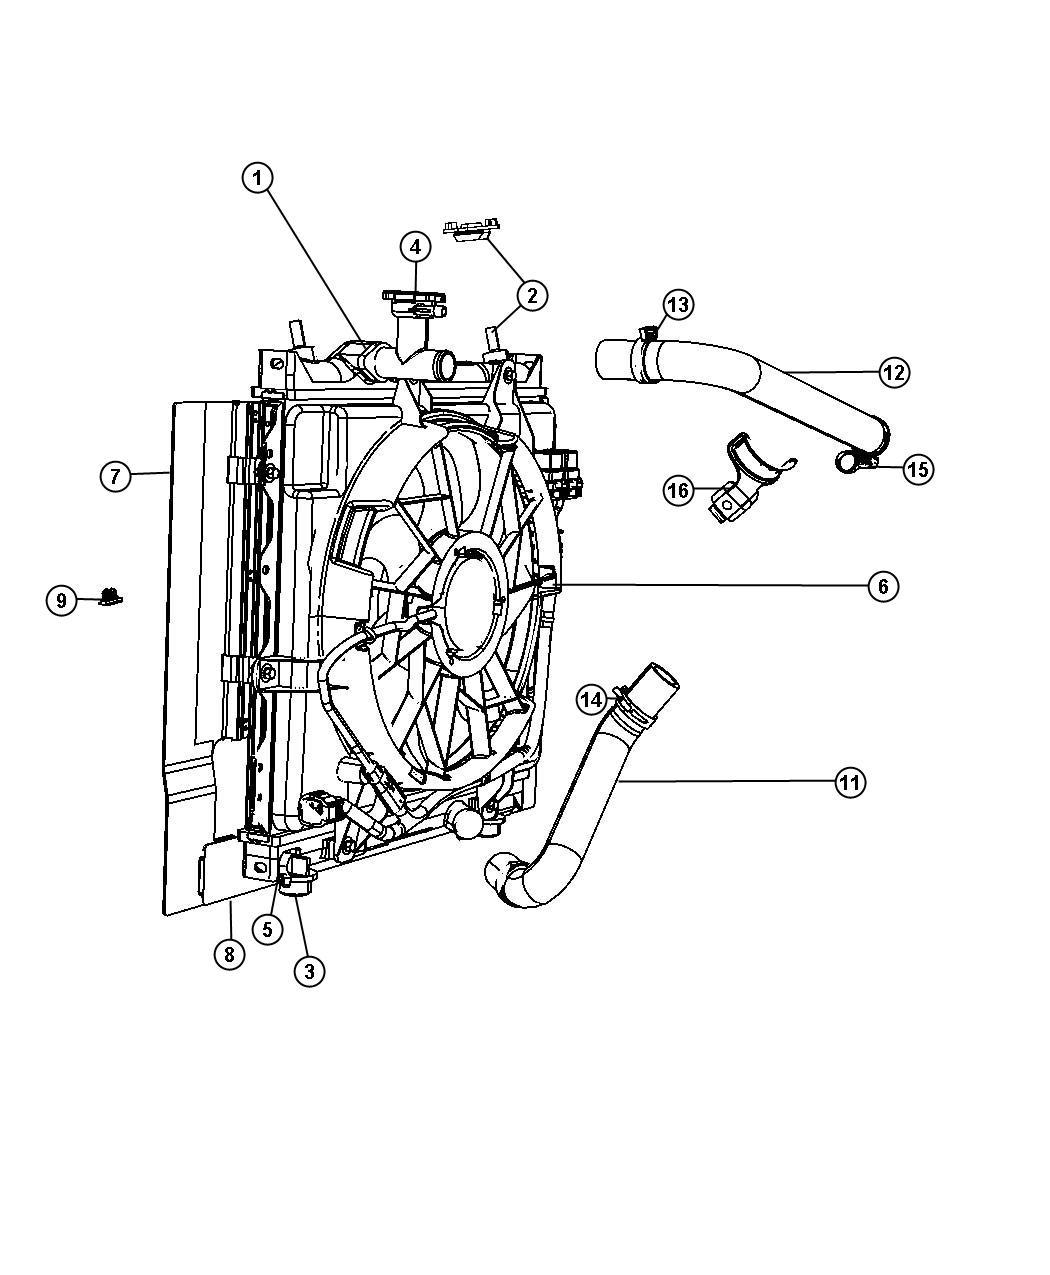 2008 Chrysler Pt Cruiser Fan module. Radiator cooling. Fan